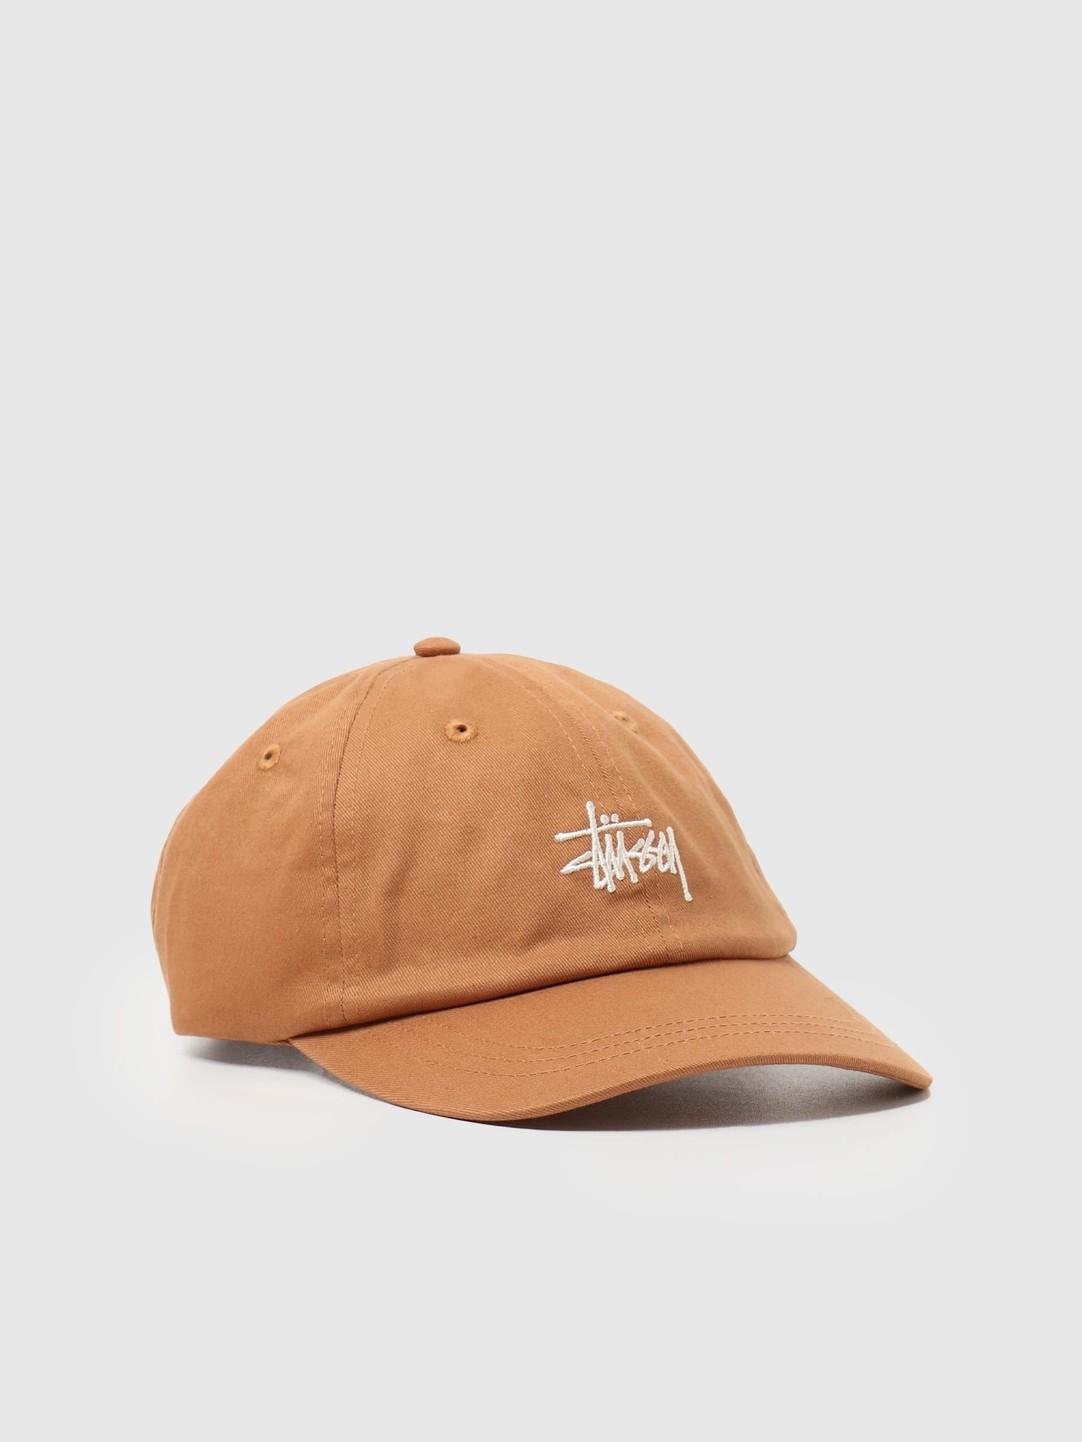 Stussy Stussy Stock Low Pro Cap Khaki 131982-1007